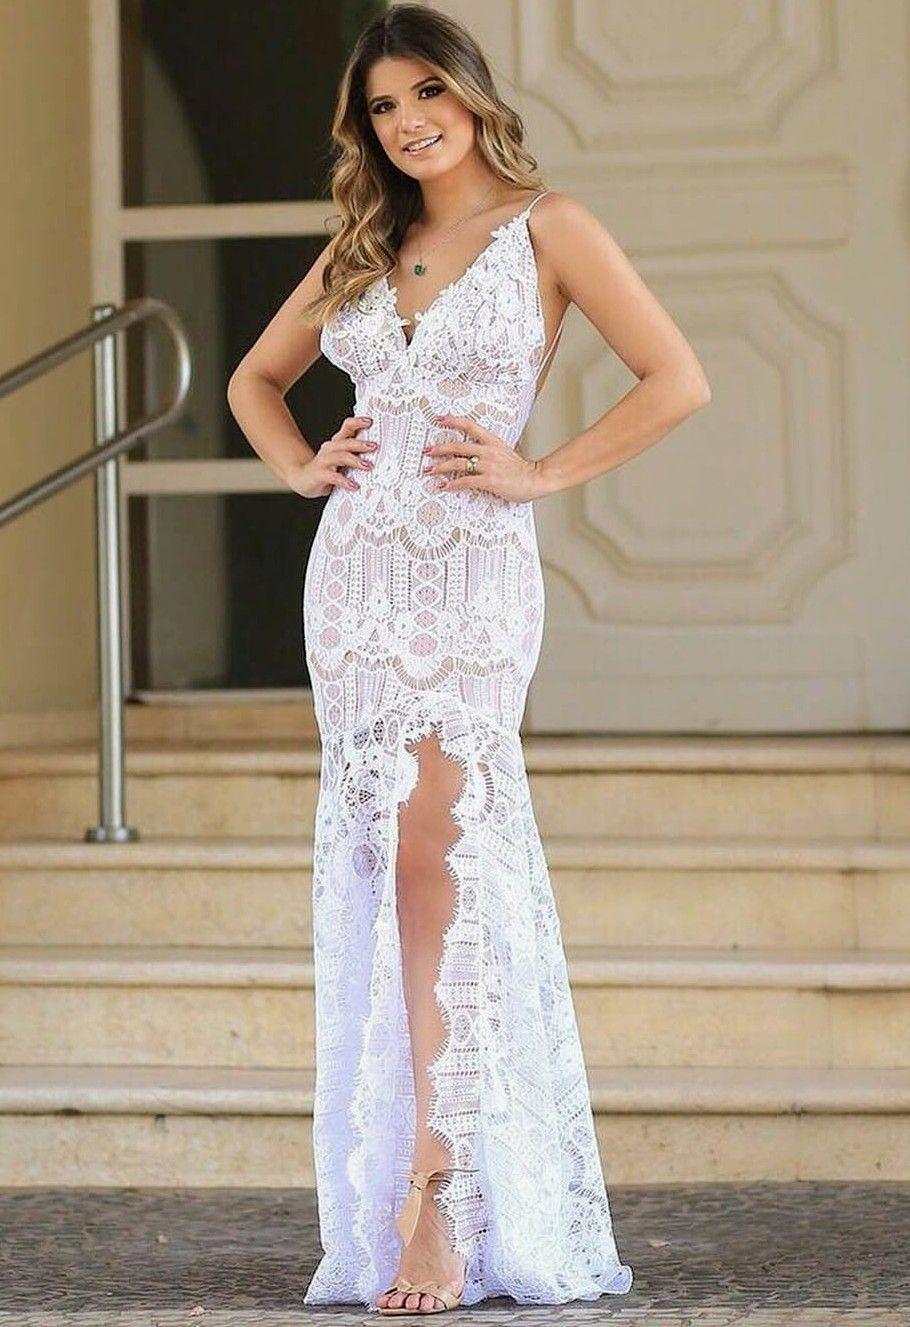 412225c26 Vestido civil Vestido Festa, Vestido Básico, Vestido Noiva Curto, Vestido  De Noiva Simples